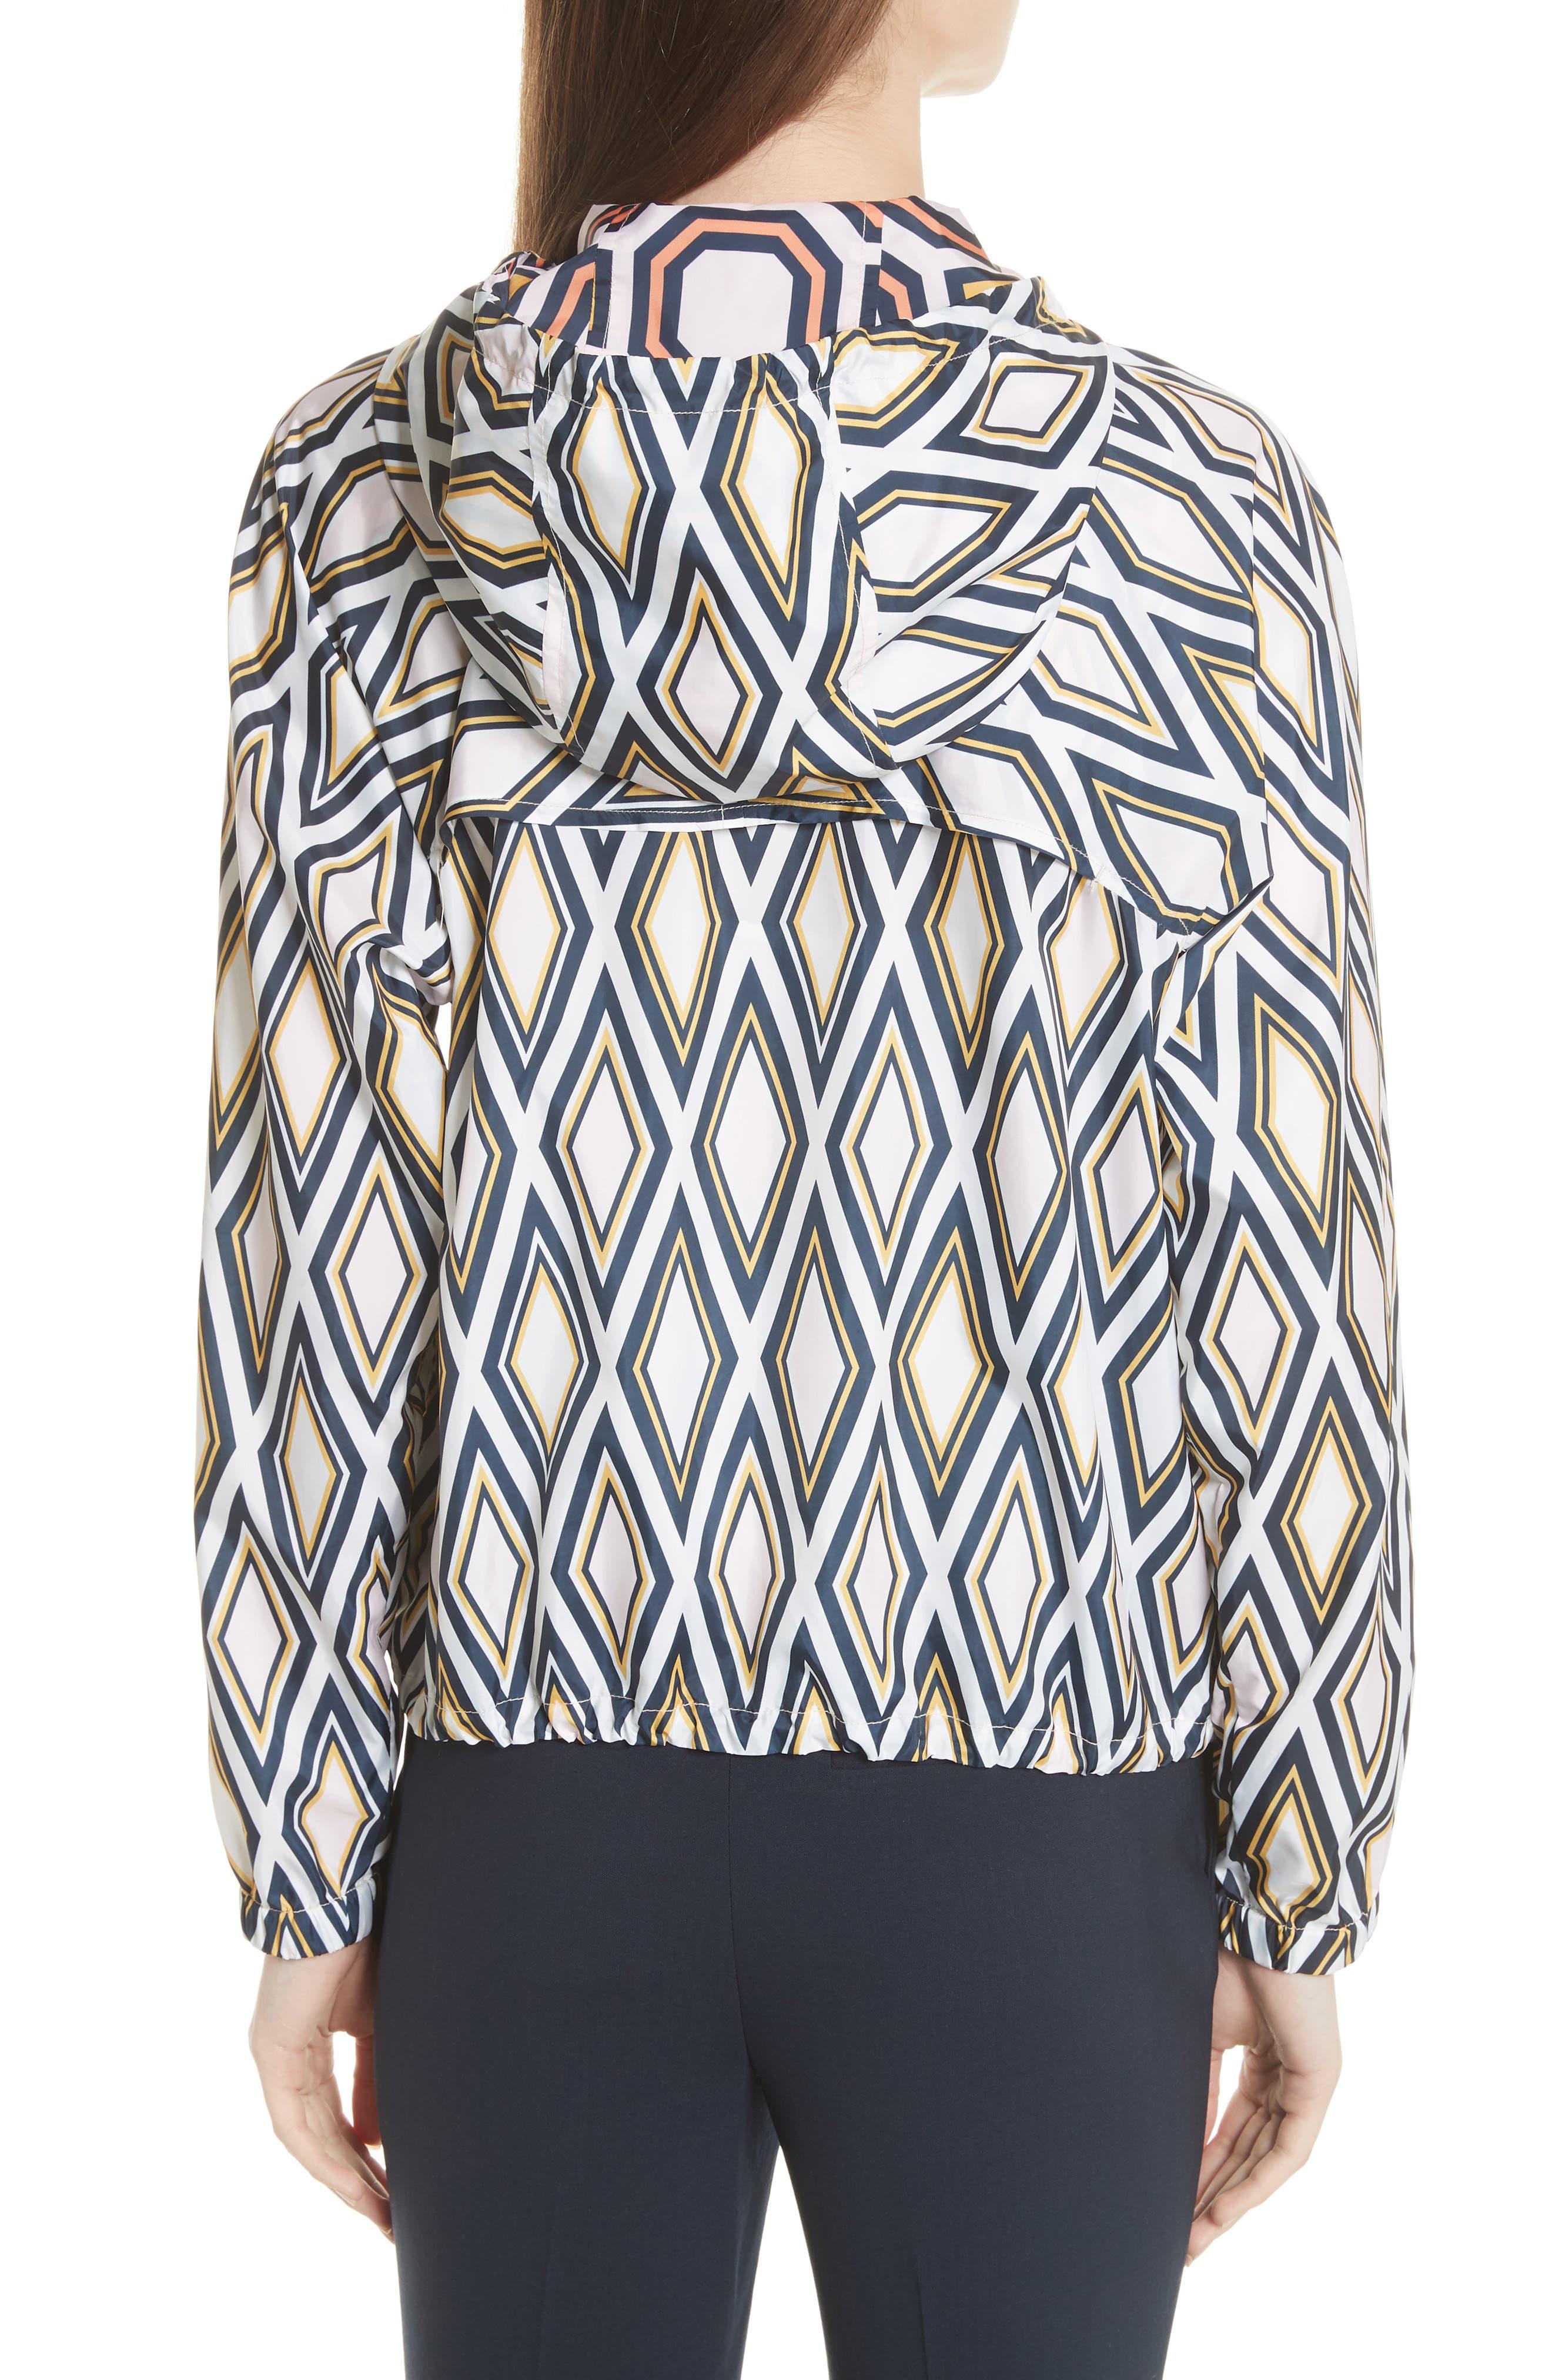 Devon Hooded Jacket,                             Alternate thumbnail 2, color,                             Solitaire Diamond